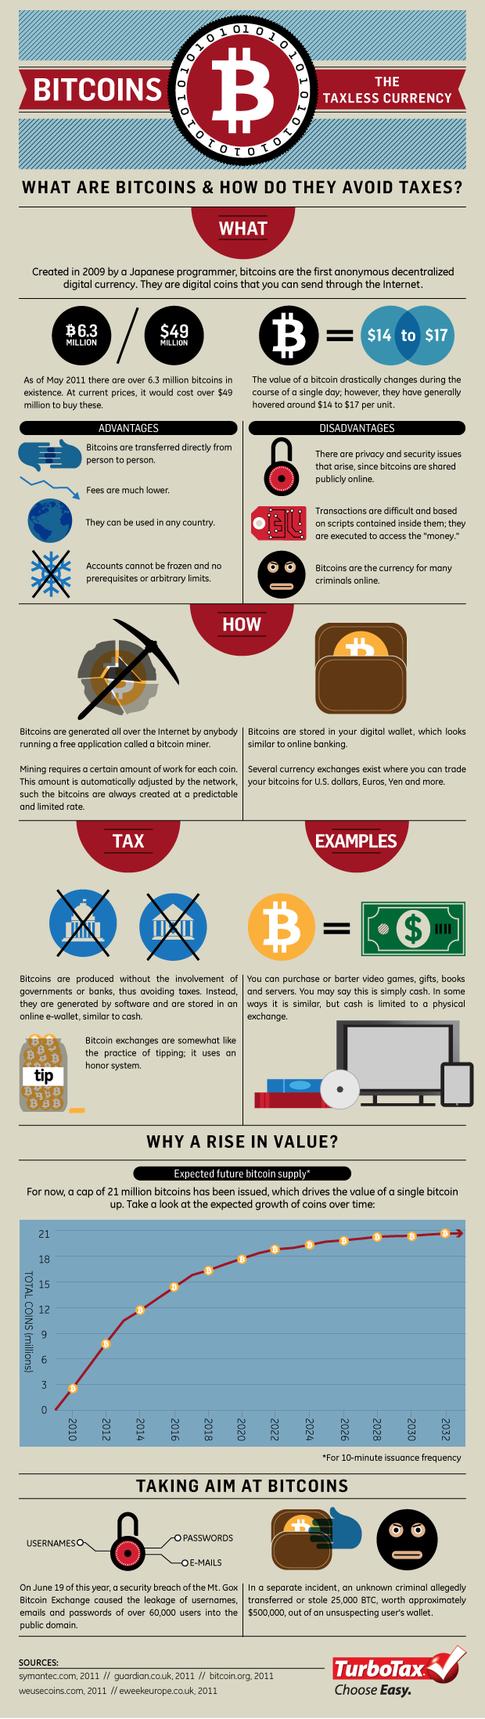 Walletbit bitcoins value betting magazine